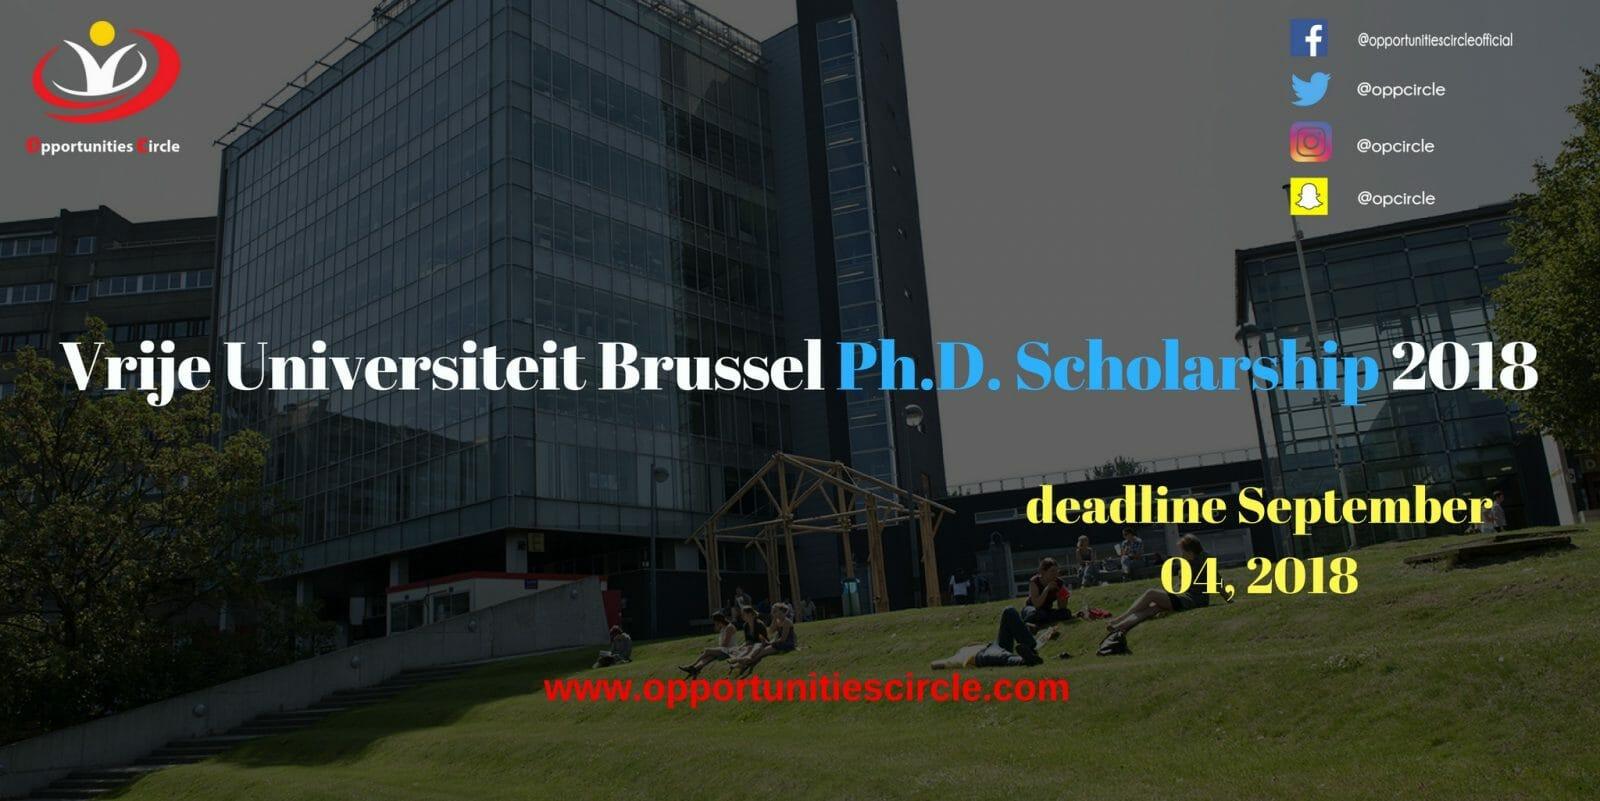 Vrije Universiteit Brussel Ph.D. Scholarship 2018 - Vrije Universiteit Brussel Ph.D. Scholarship 2018